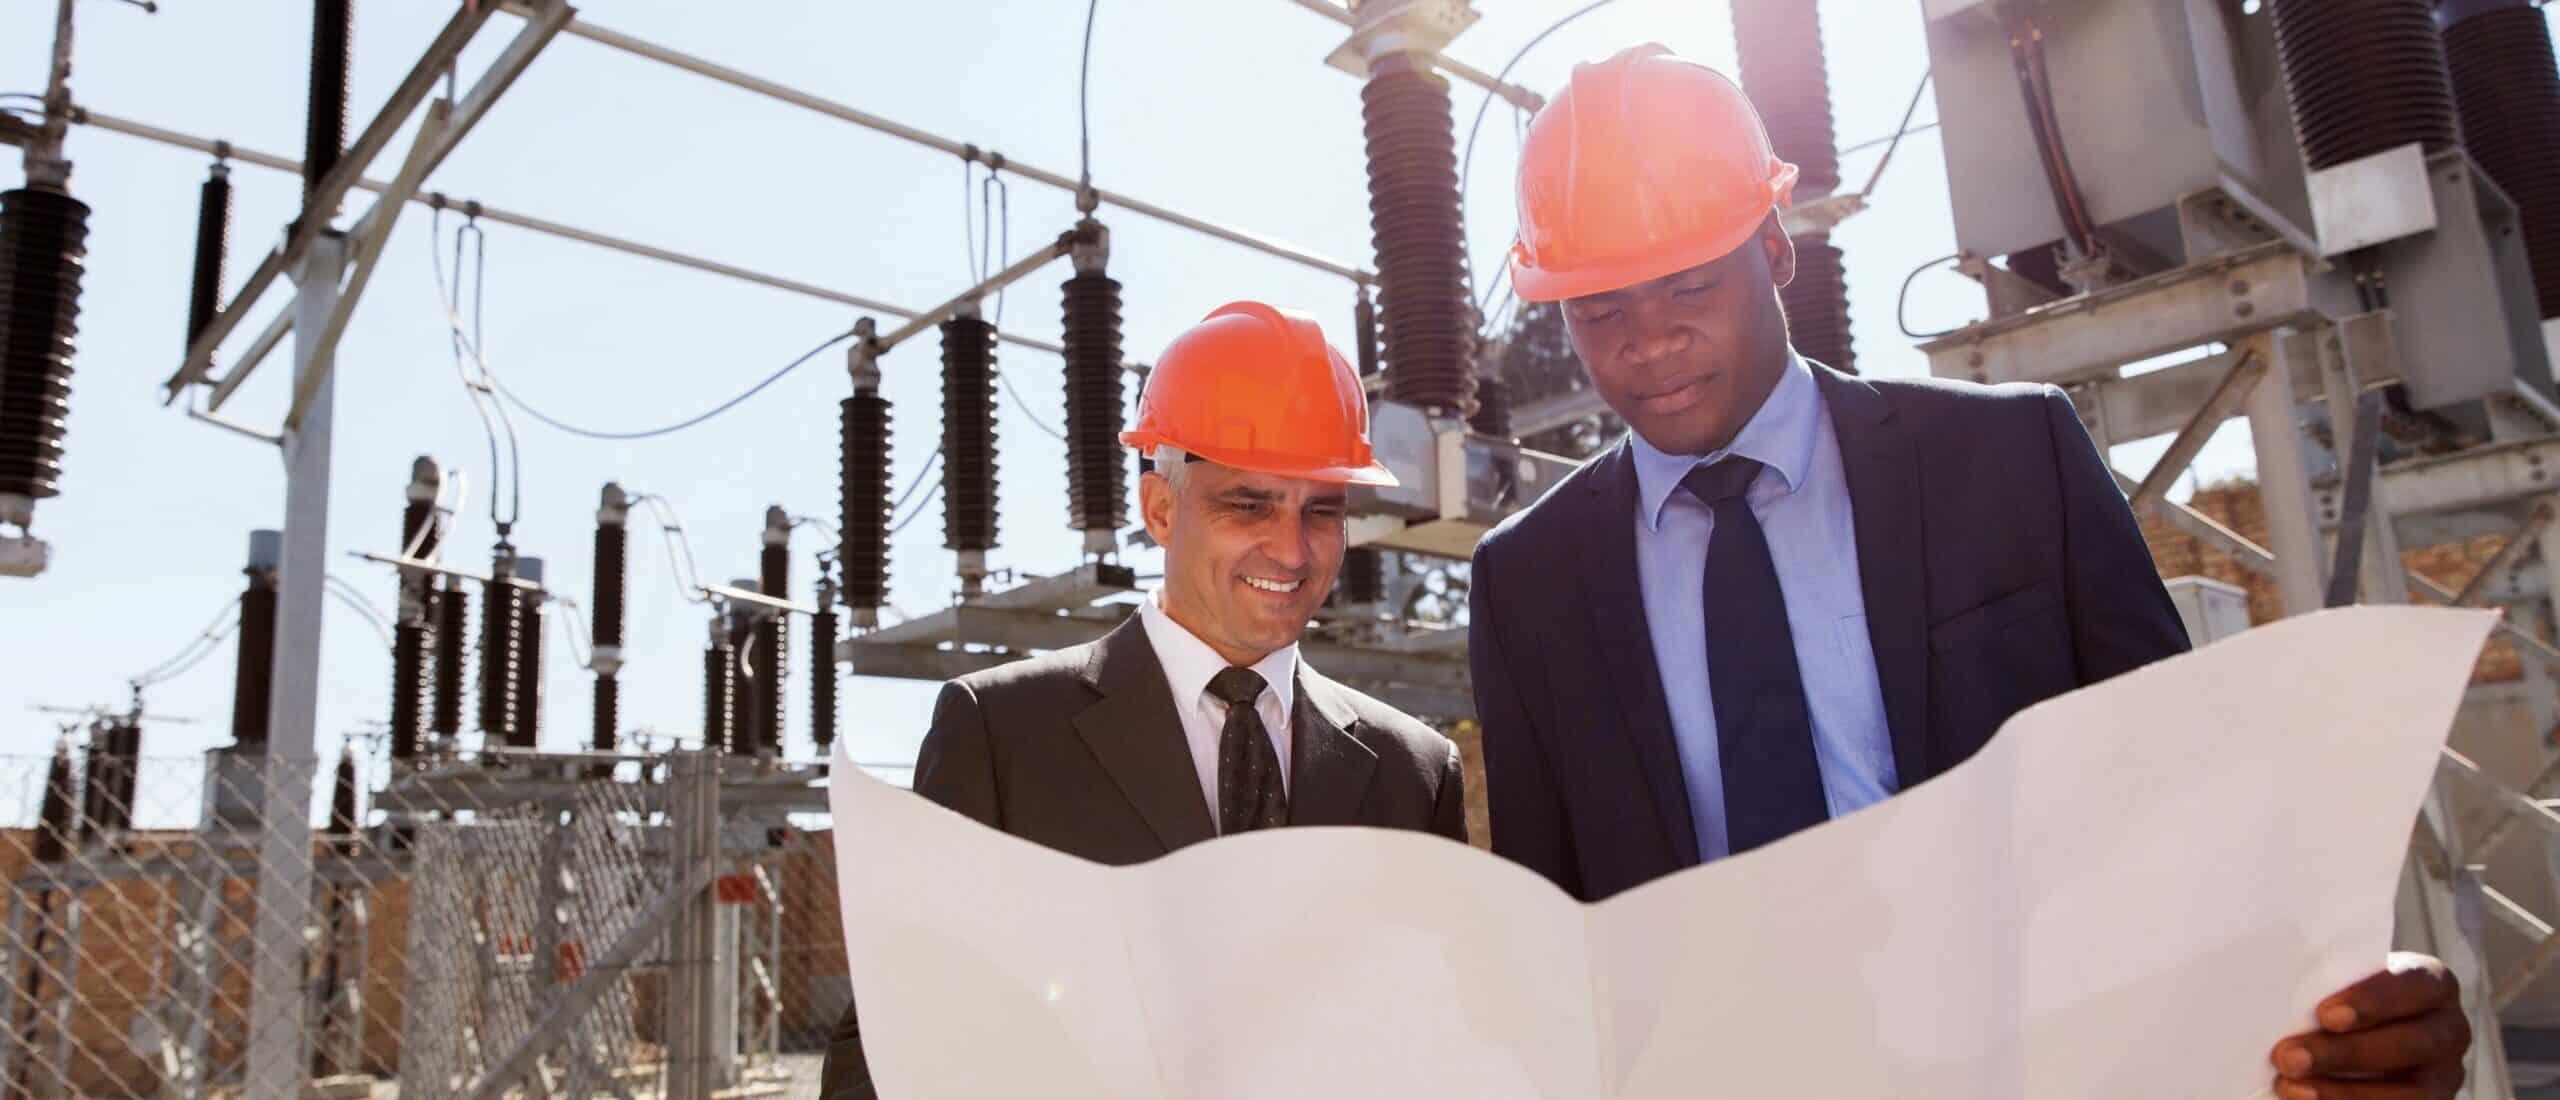 wisconsin municipal utilities consulting hero